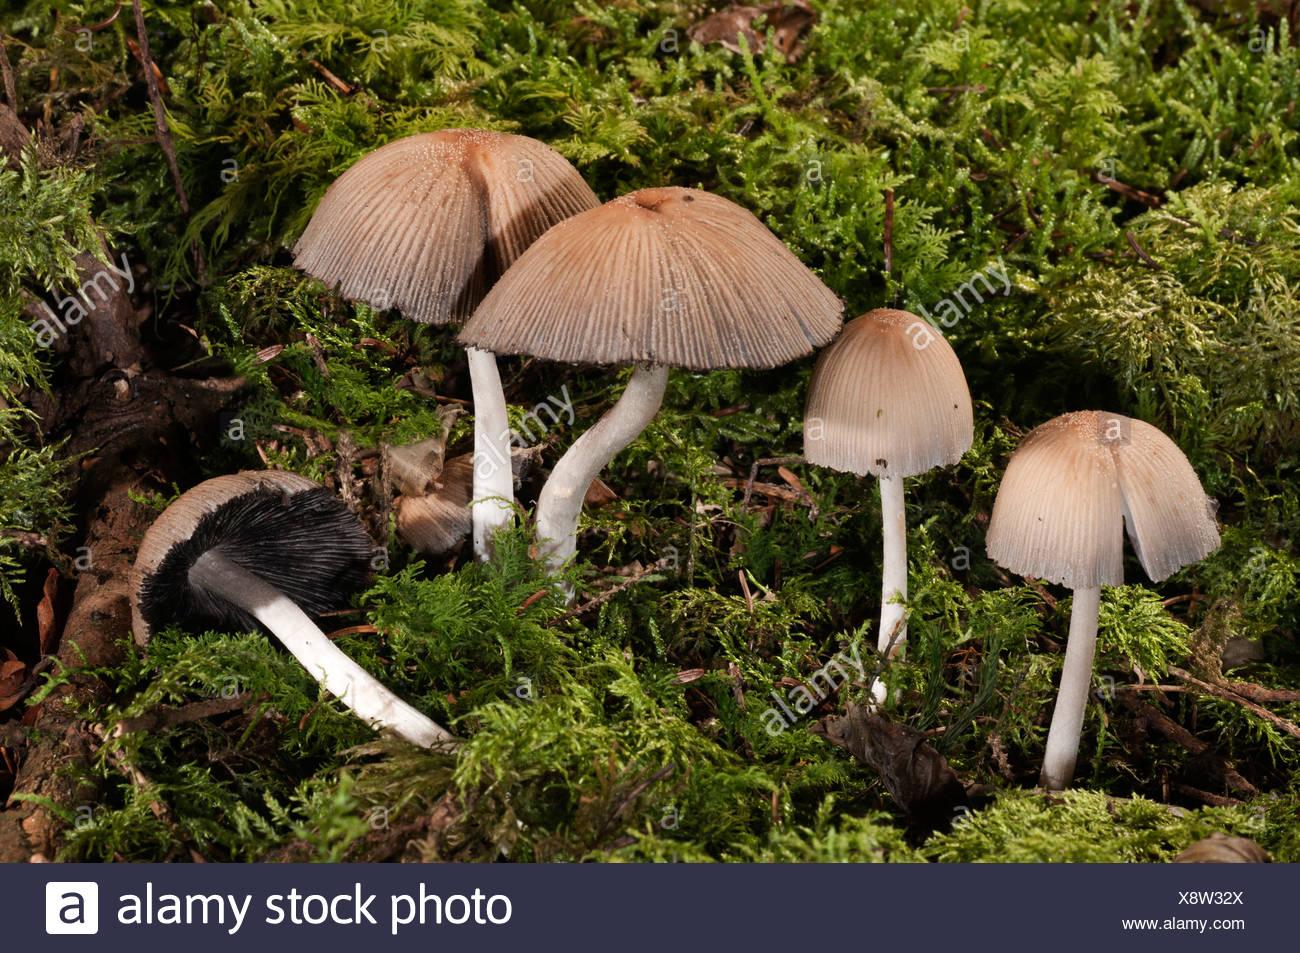 Mica Cap or Glistening Inky Cap (Coprinus micaceus), Untergroeningen, Baden-Wuerttemberg, Germany, Europe - Stock Image